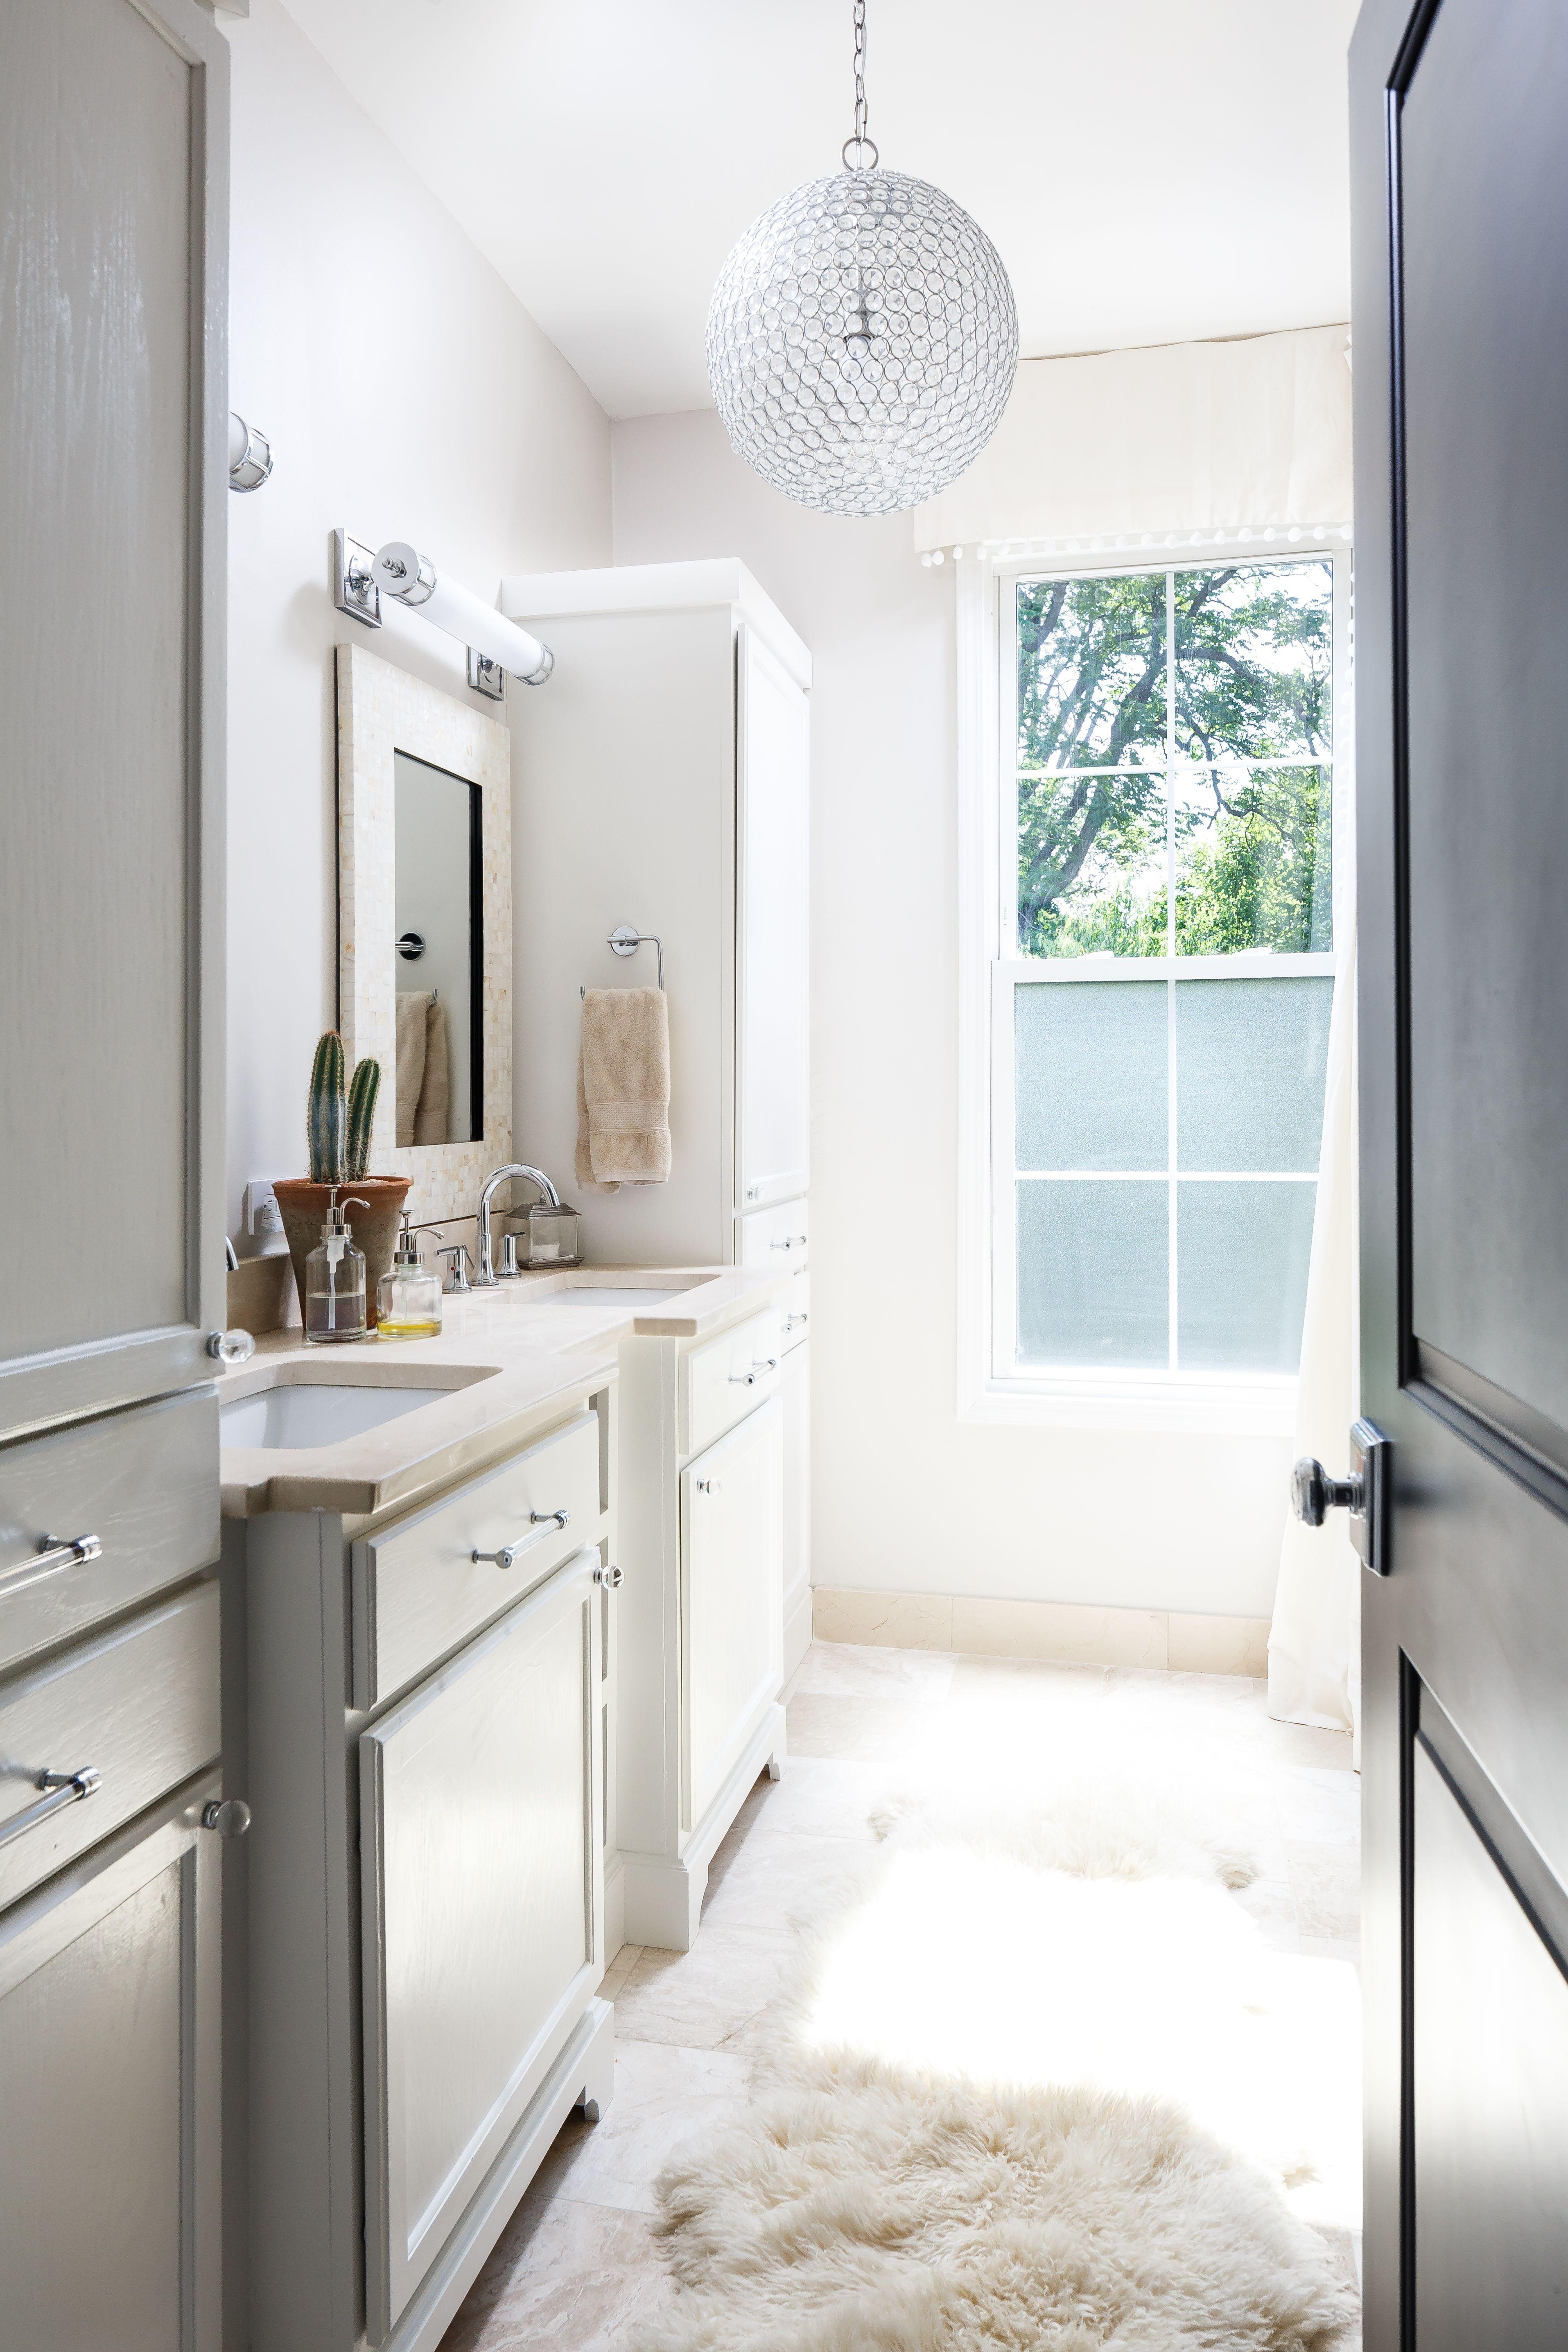 Bethany Adams Interiors | Serene Master Bathroom © 2016 RealTourCast | Tim  Furlong Jr.